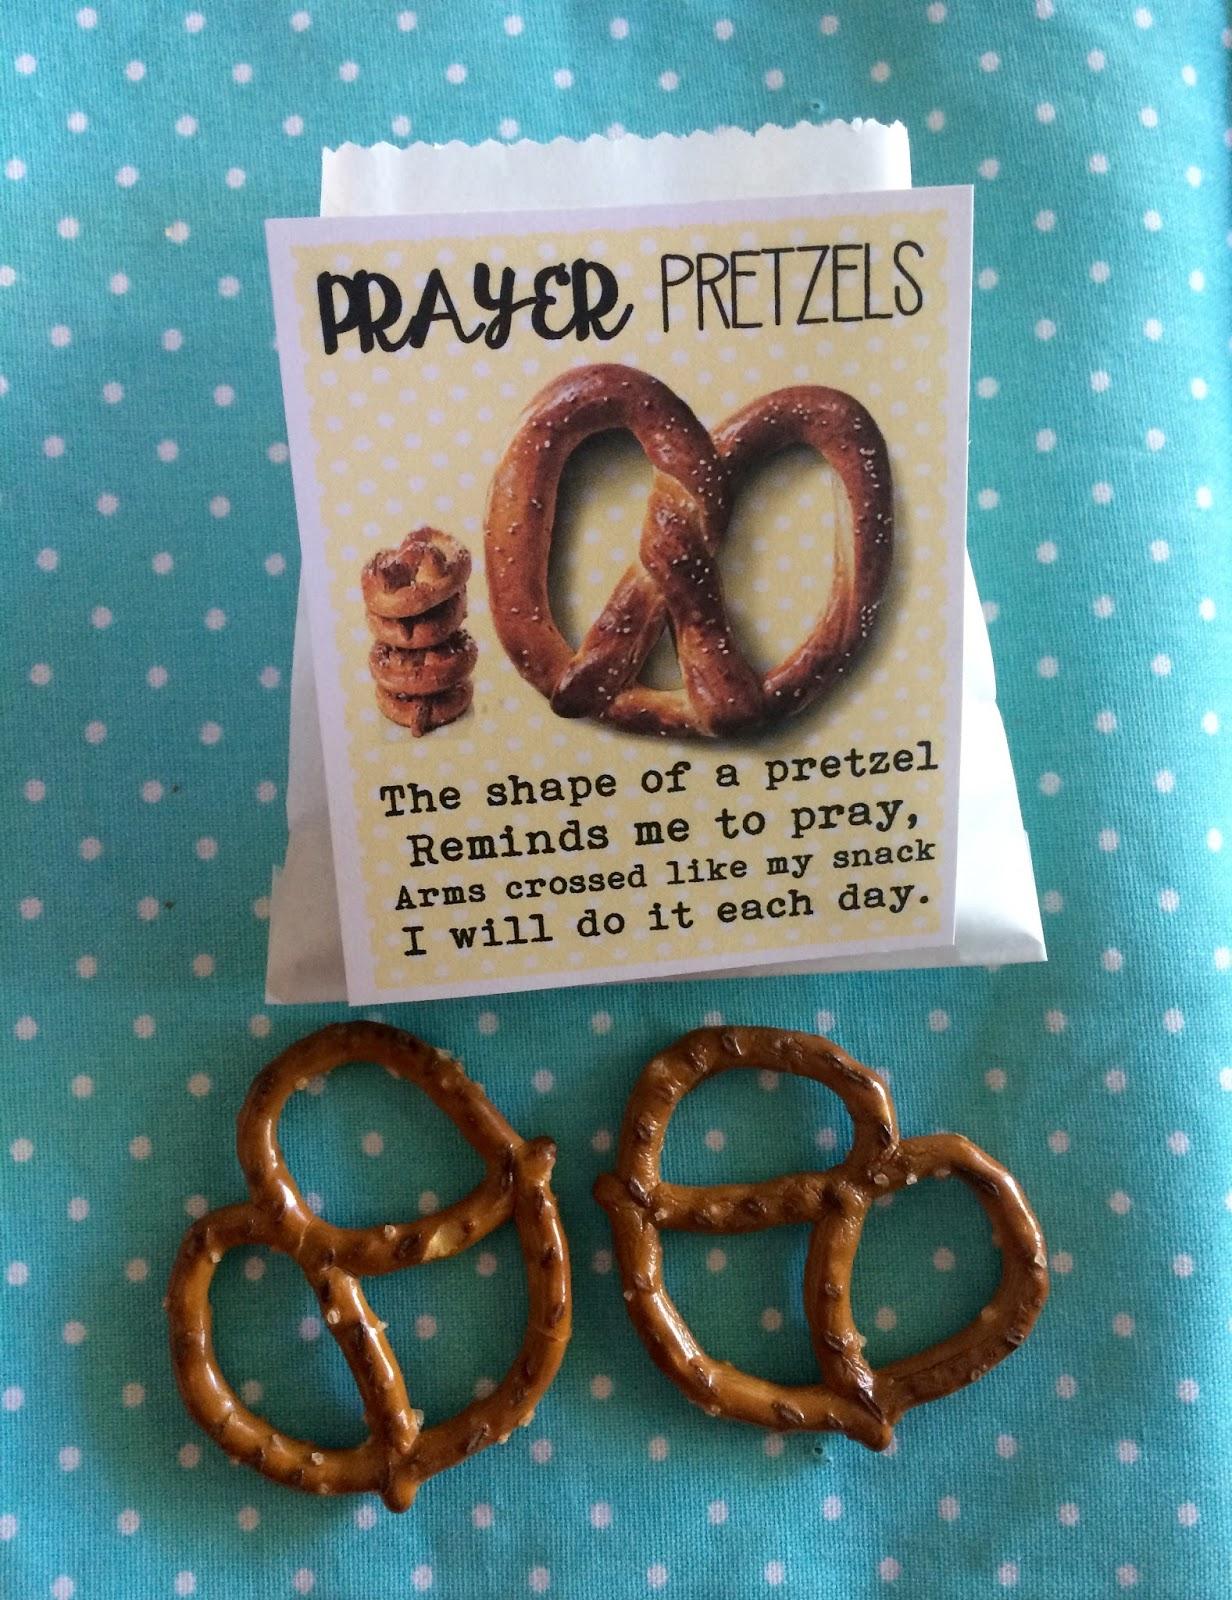 Marci Coombs Prayer Pretzels Handout